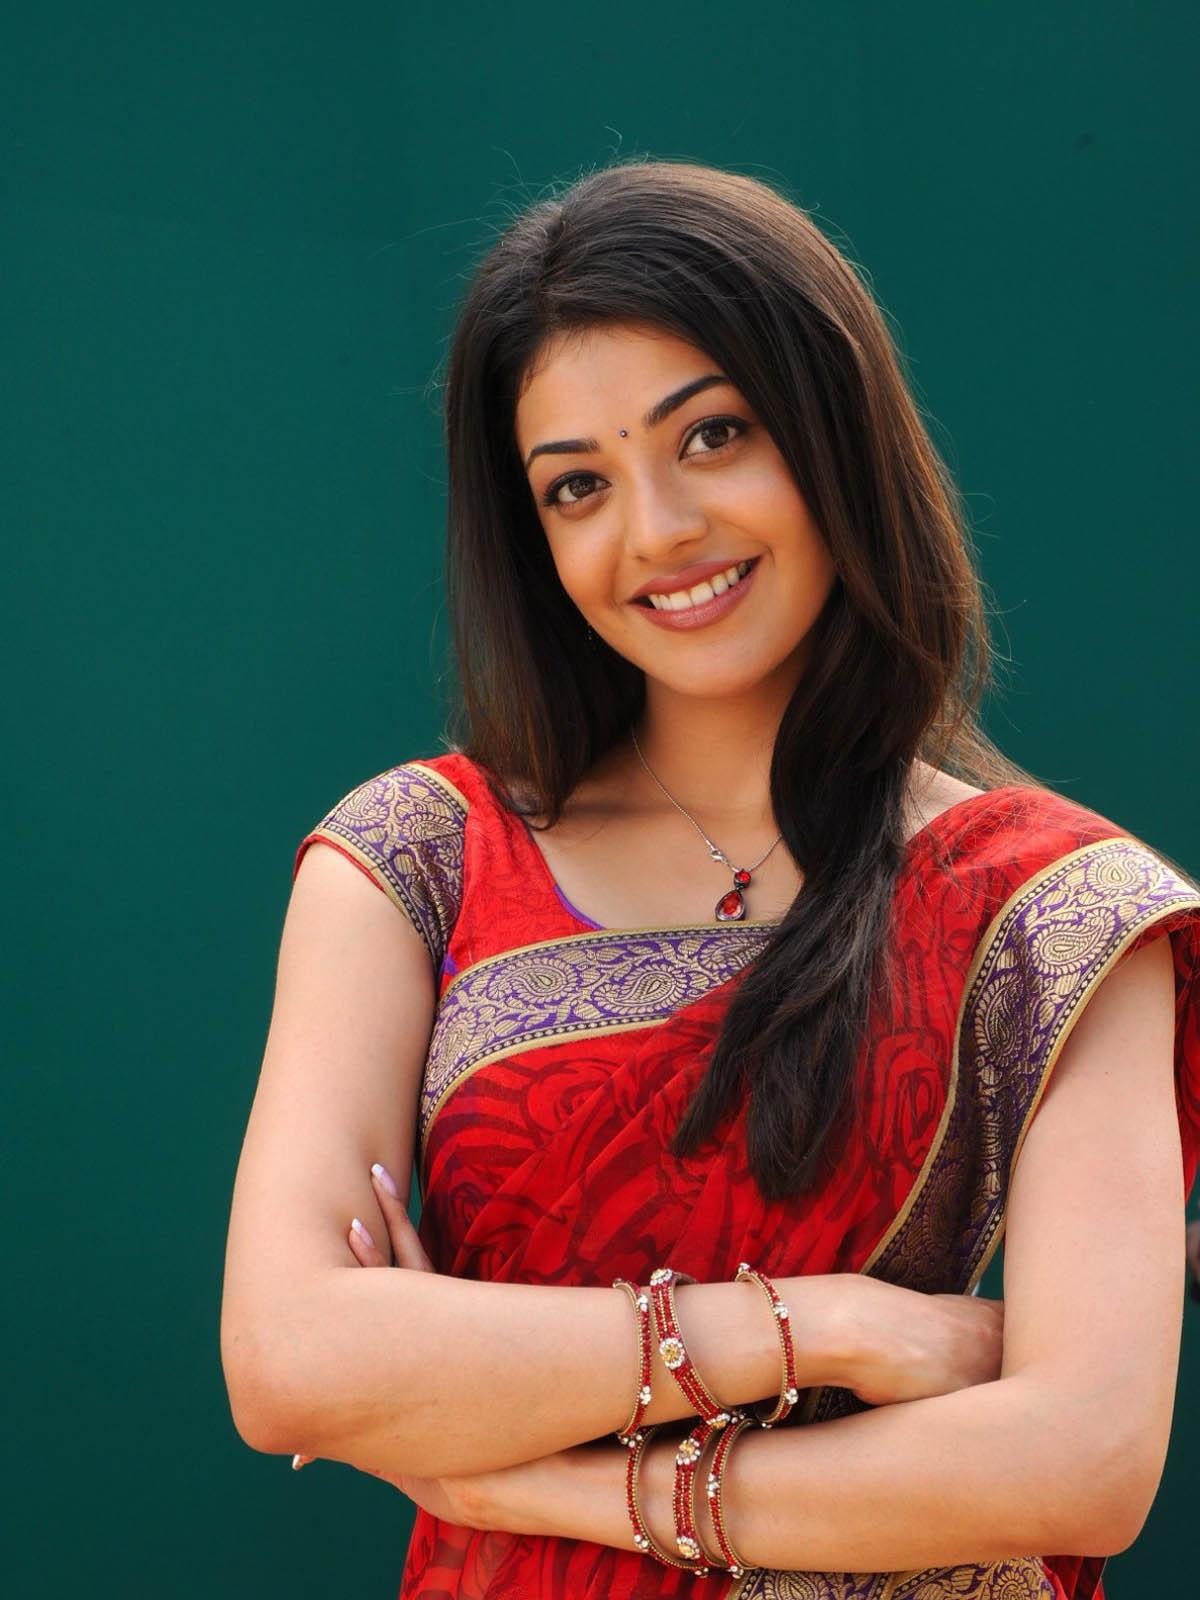 saree wallpapers kajal agarwal - photo #8